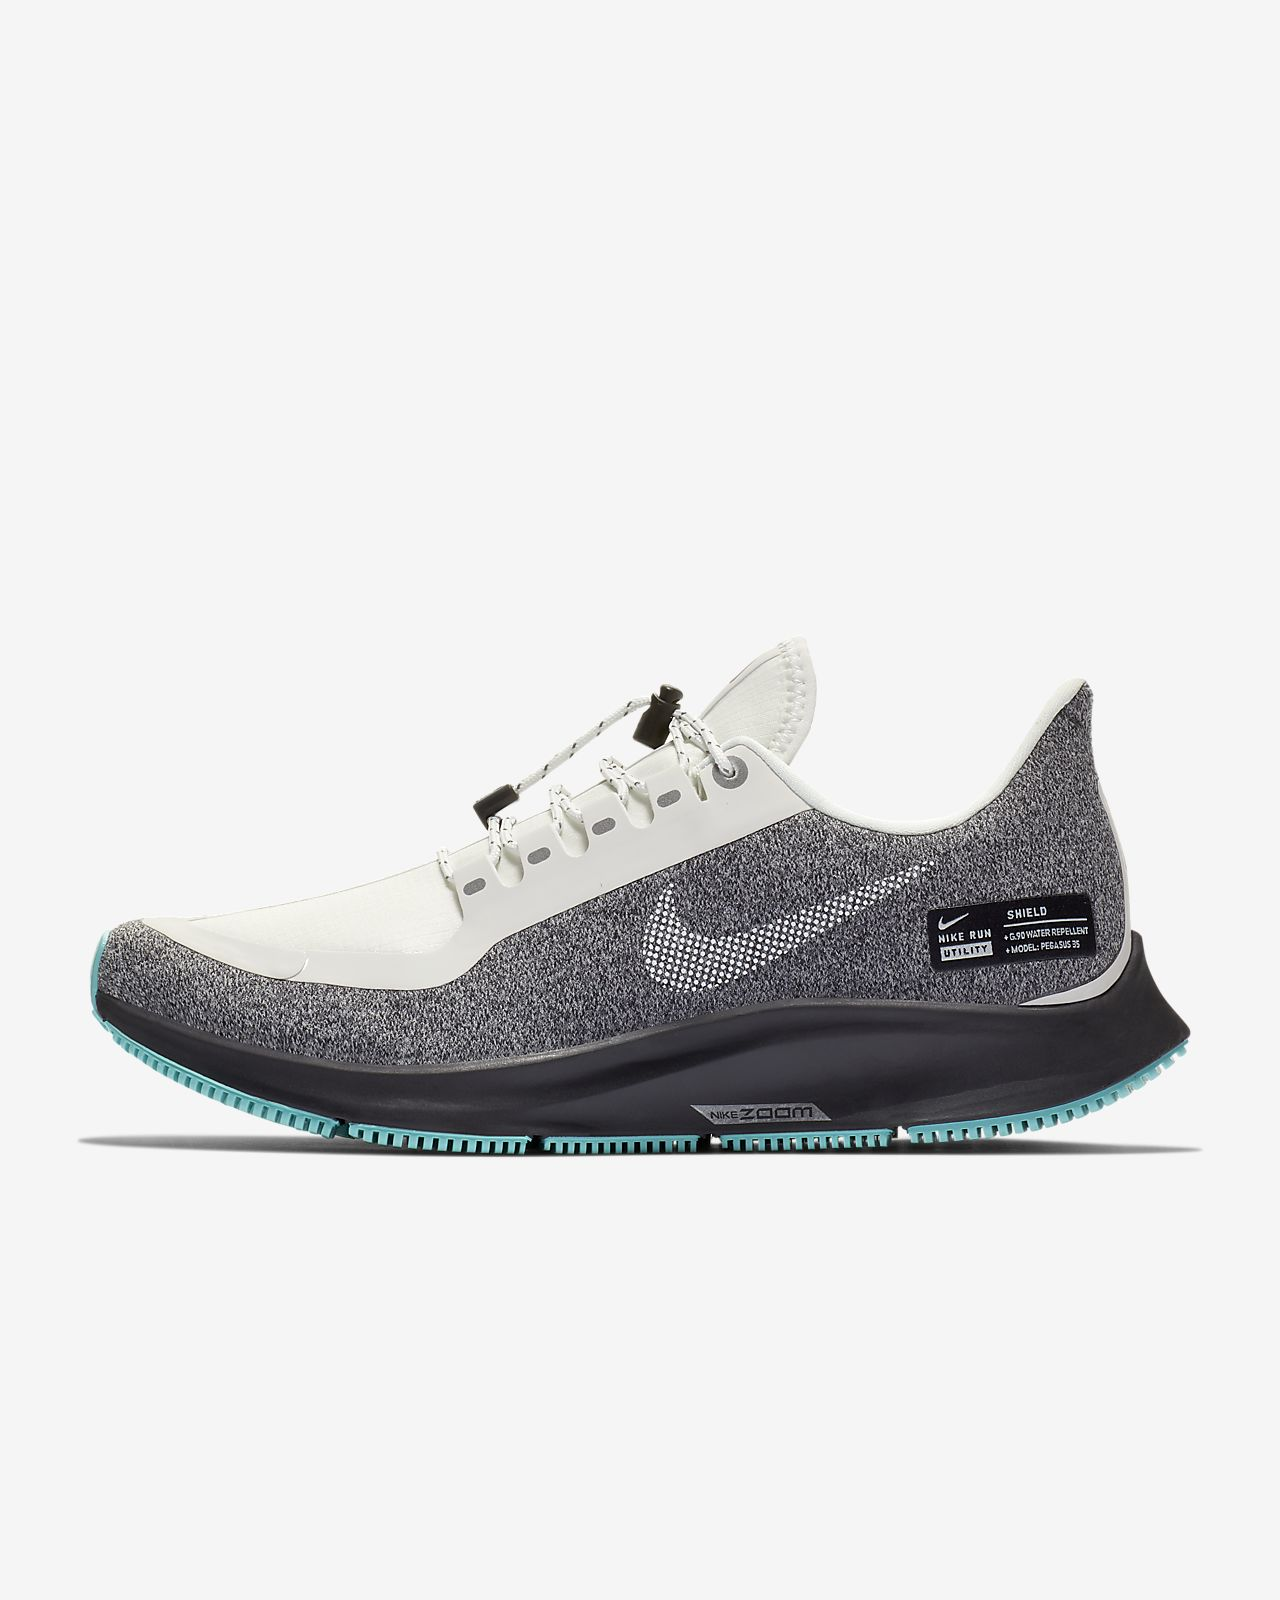 6ce1212f941da Nike Air Zoom Pegasus 35 Shield Water-Repellent Damen-Laufschuh ...